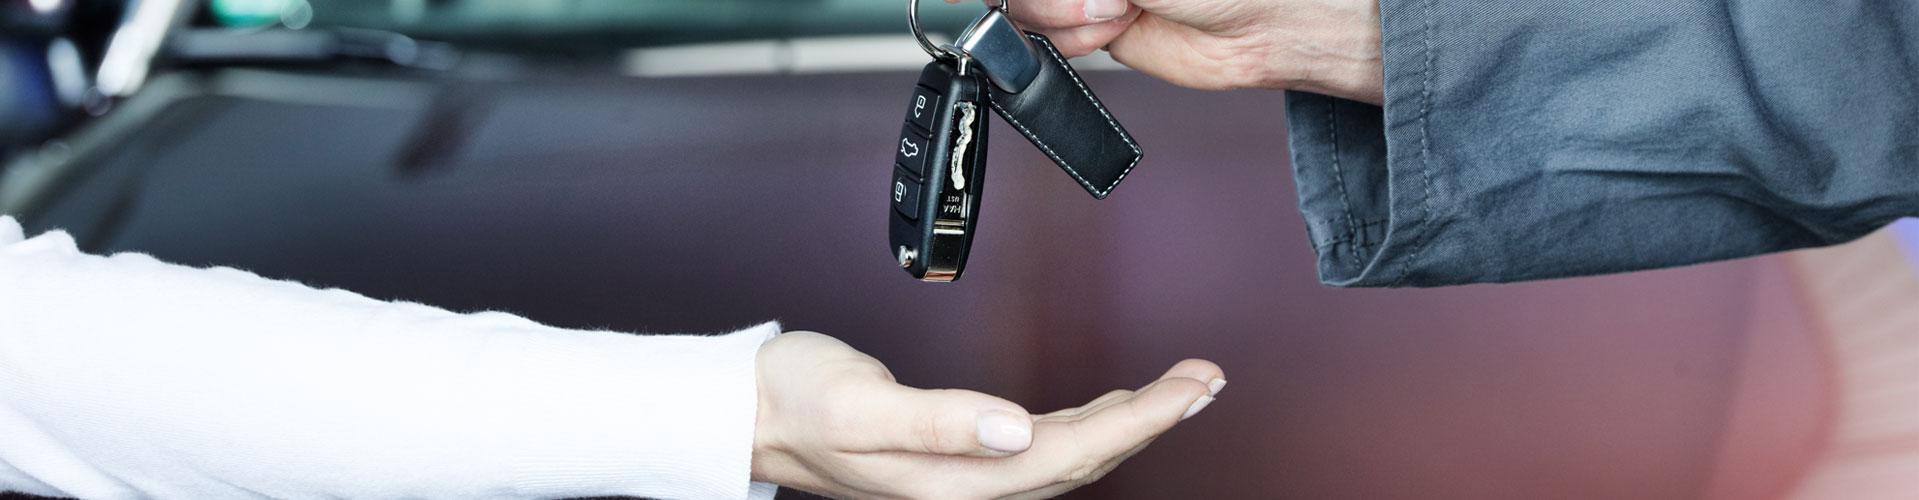 Mechanic returning key to customer